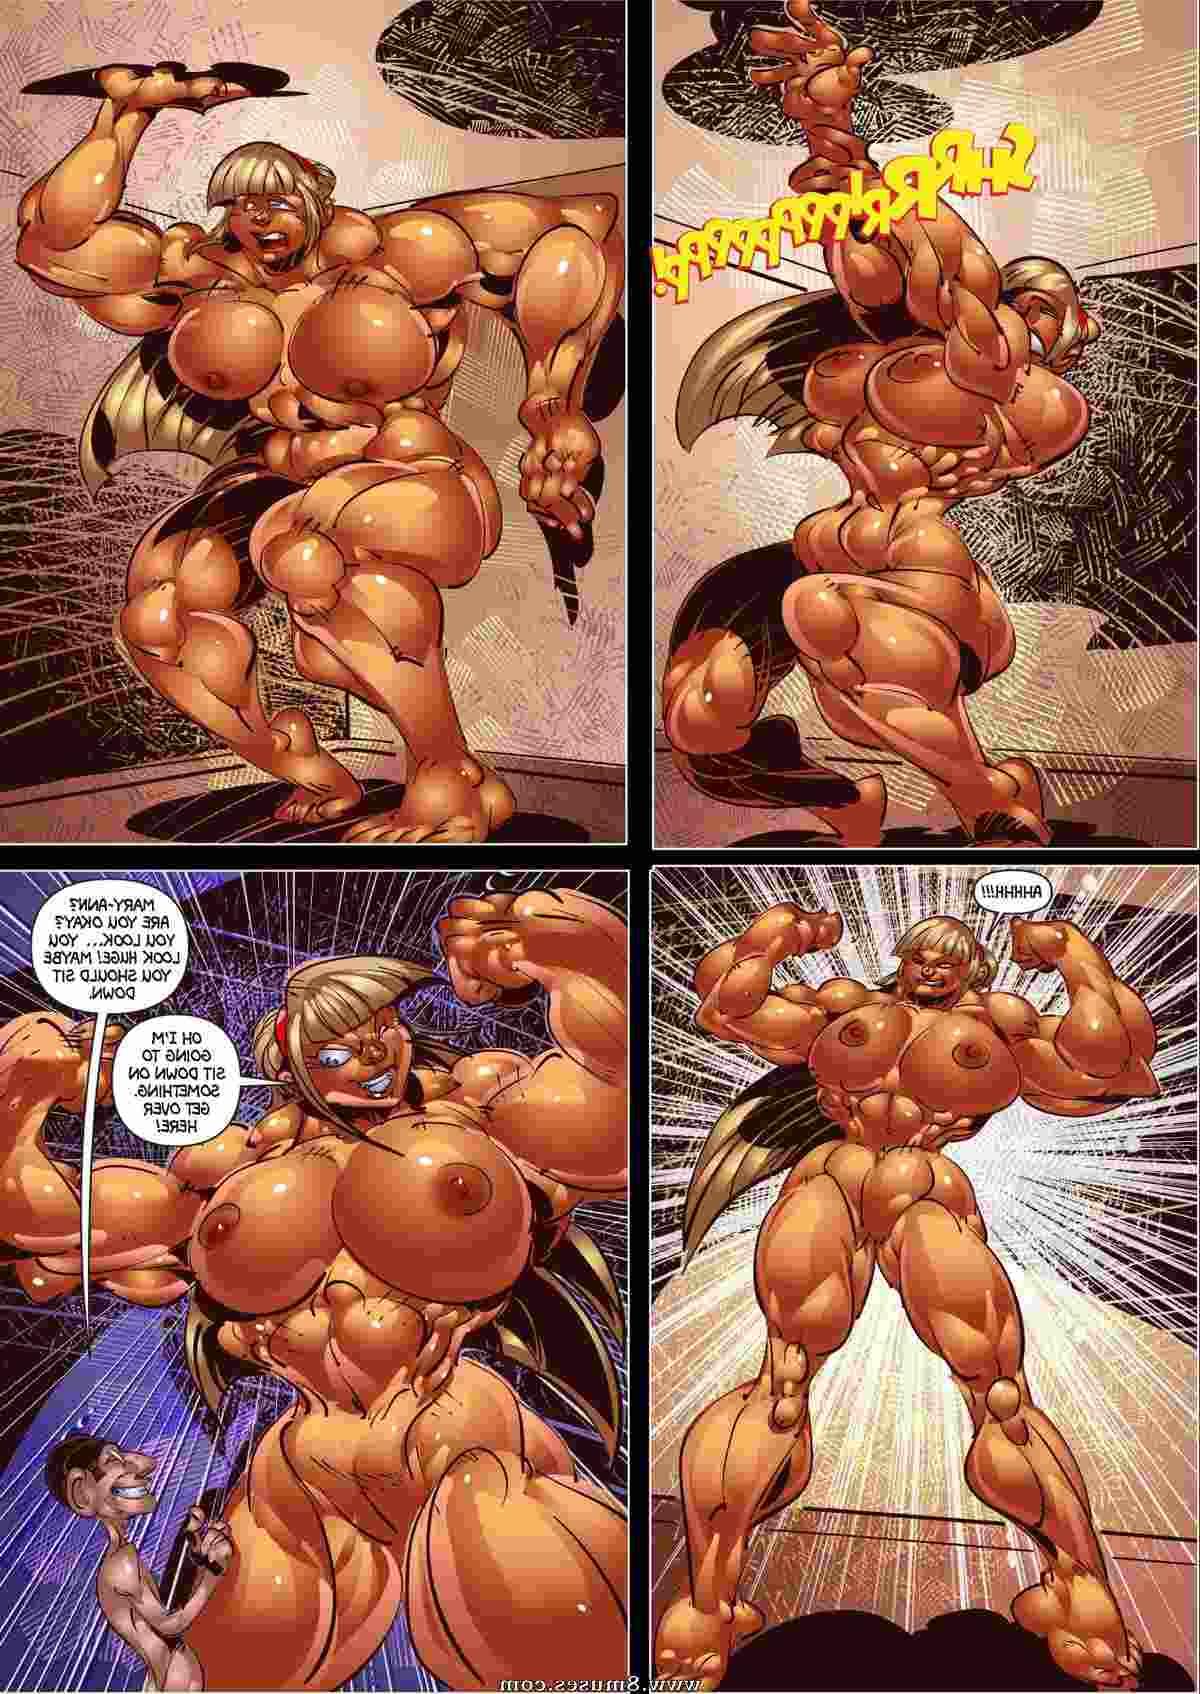 Female Muscle Growth Hemtai